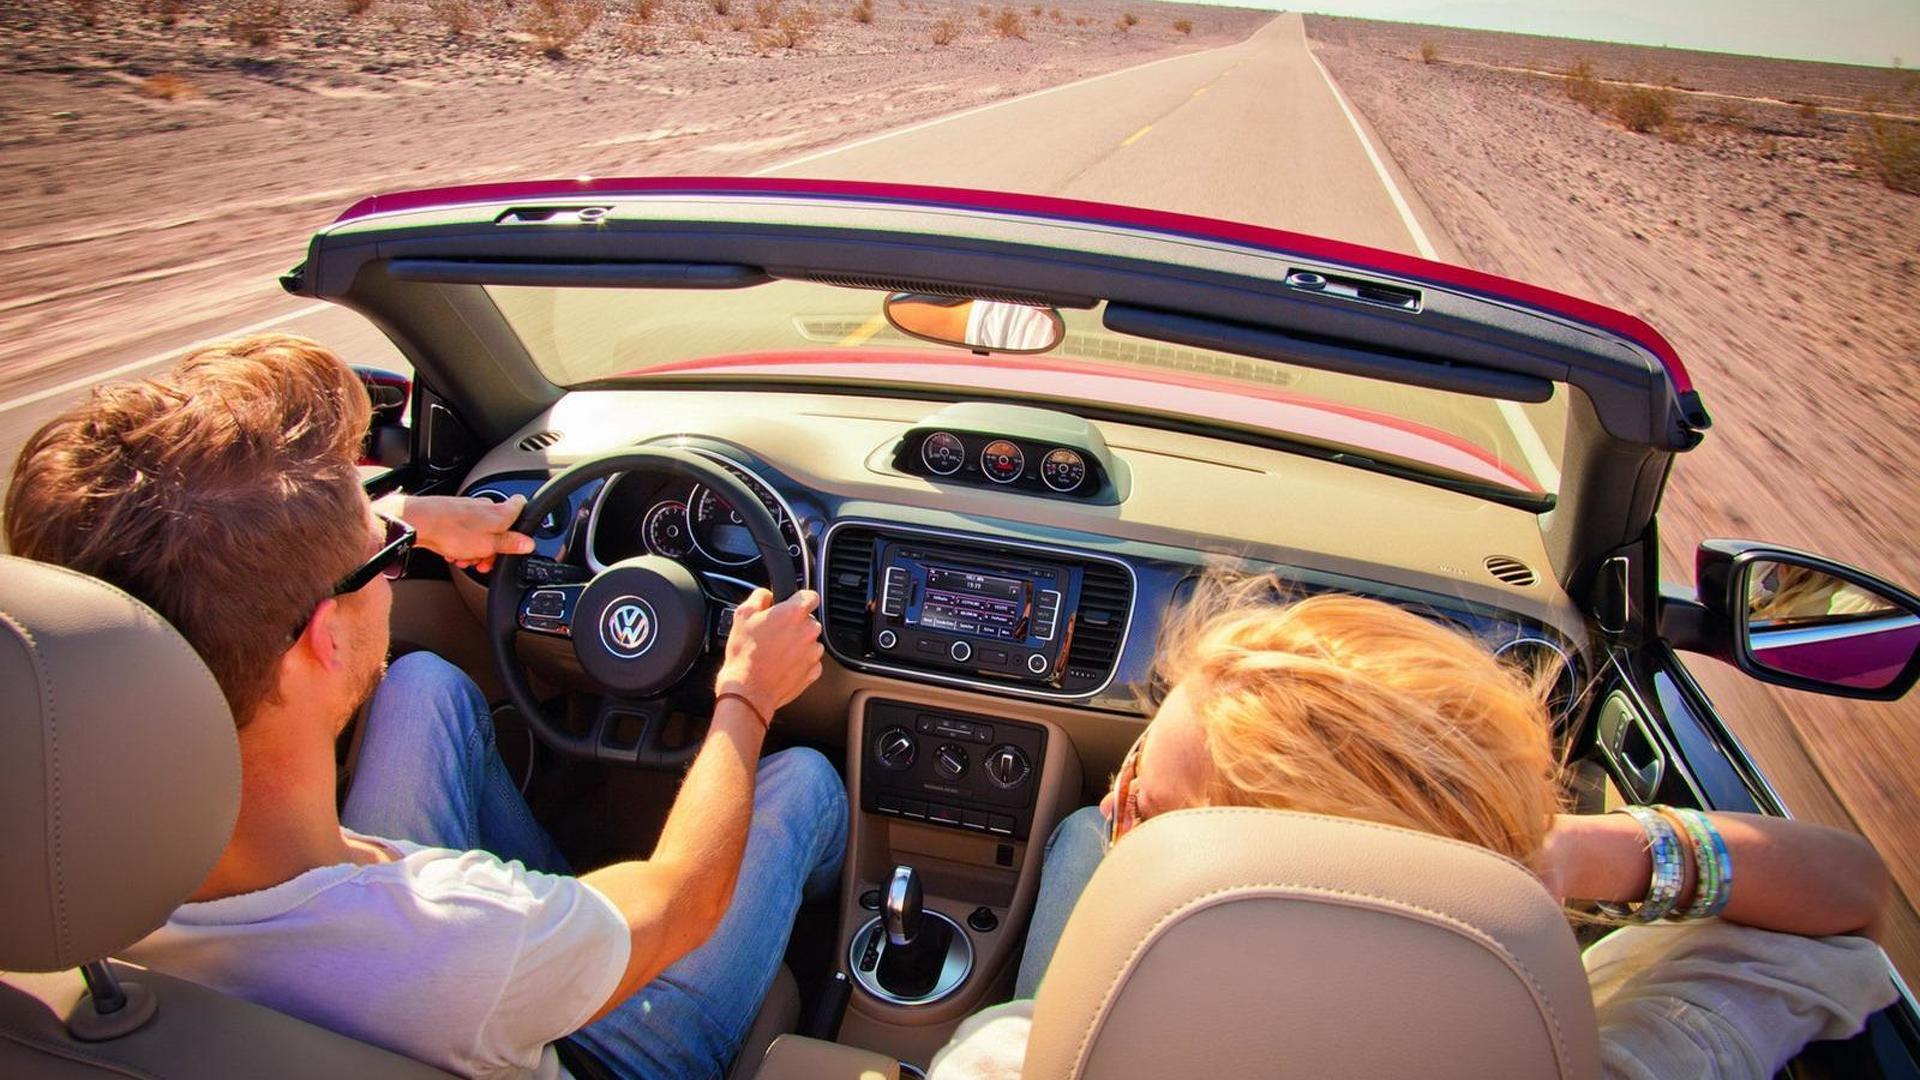 2013 Volkswagen Beetle Cabriolet drops its top in L.A. [videos]